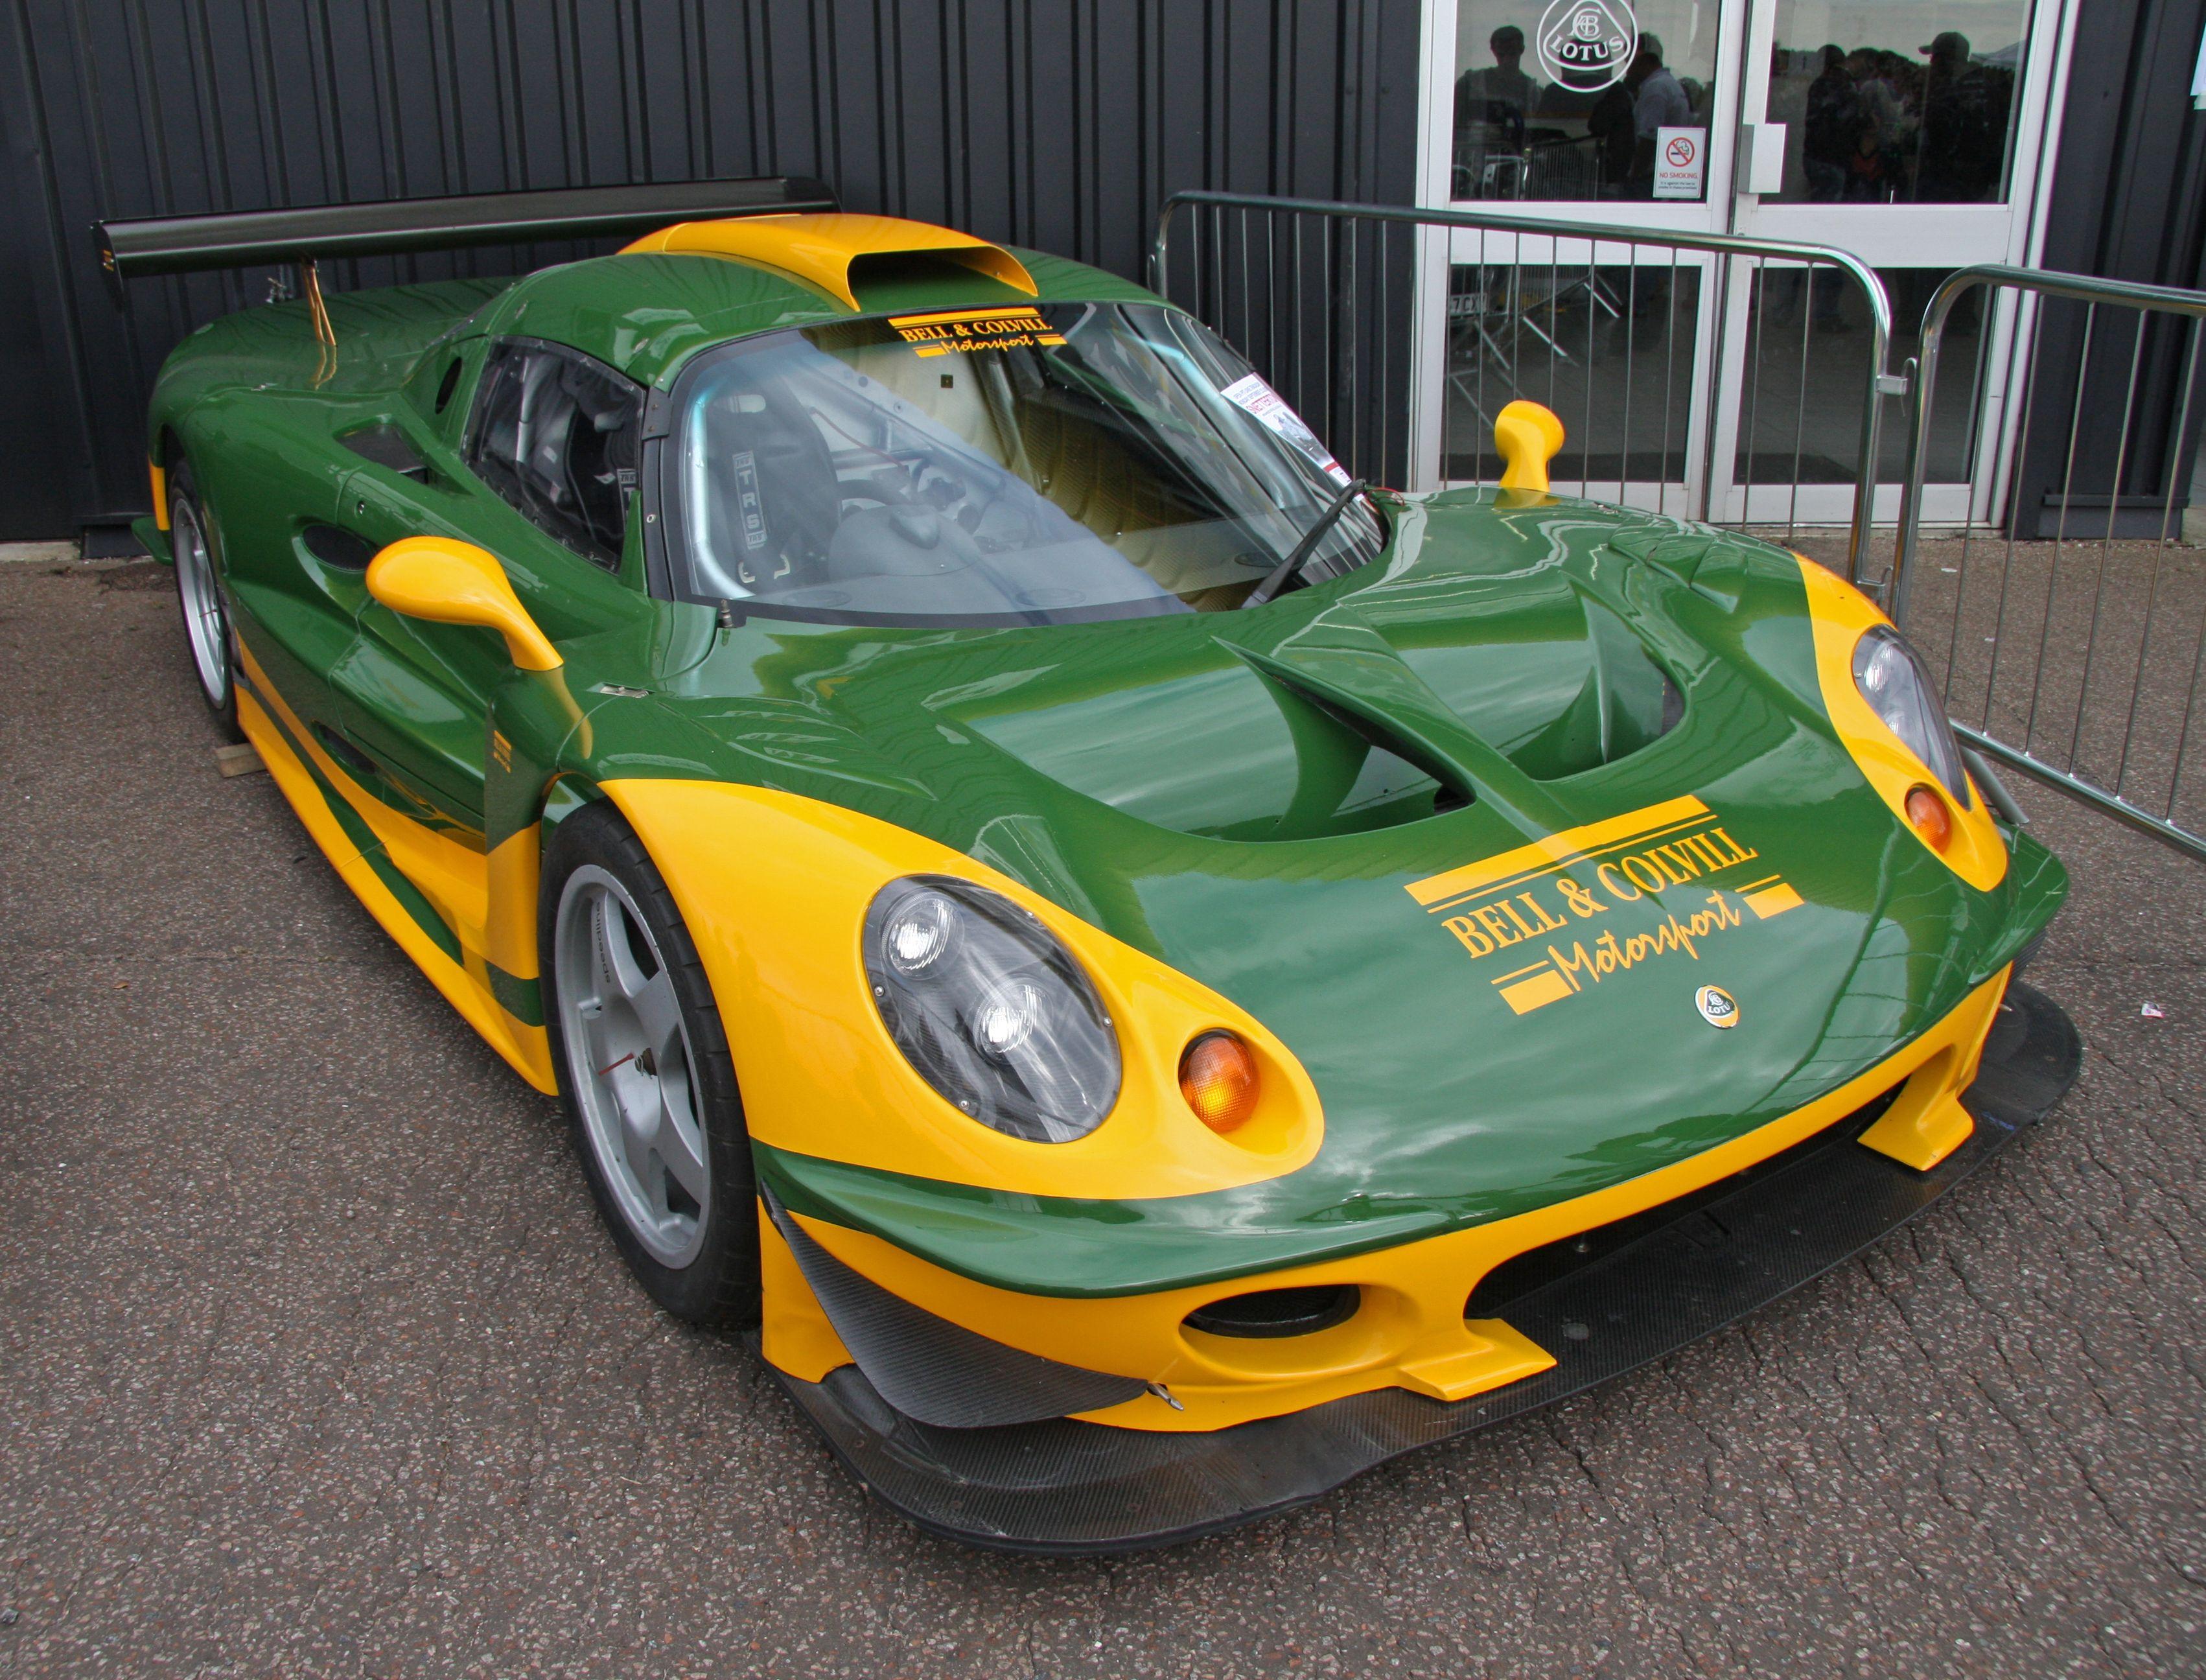 lotus cars - Cerca con Google | Lotus | Pinterest | Lotus, Lotus ...